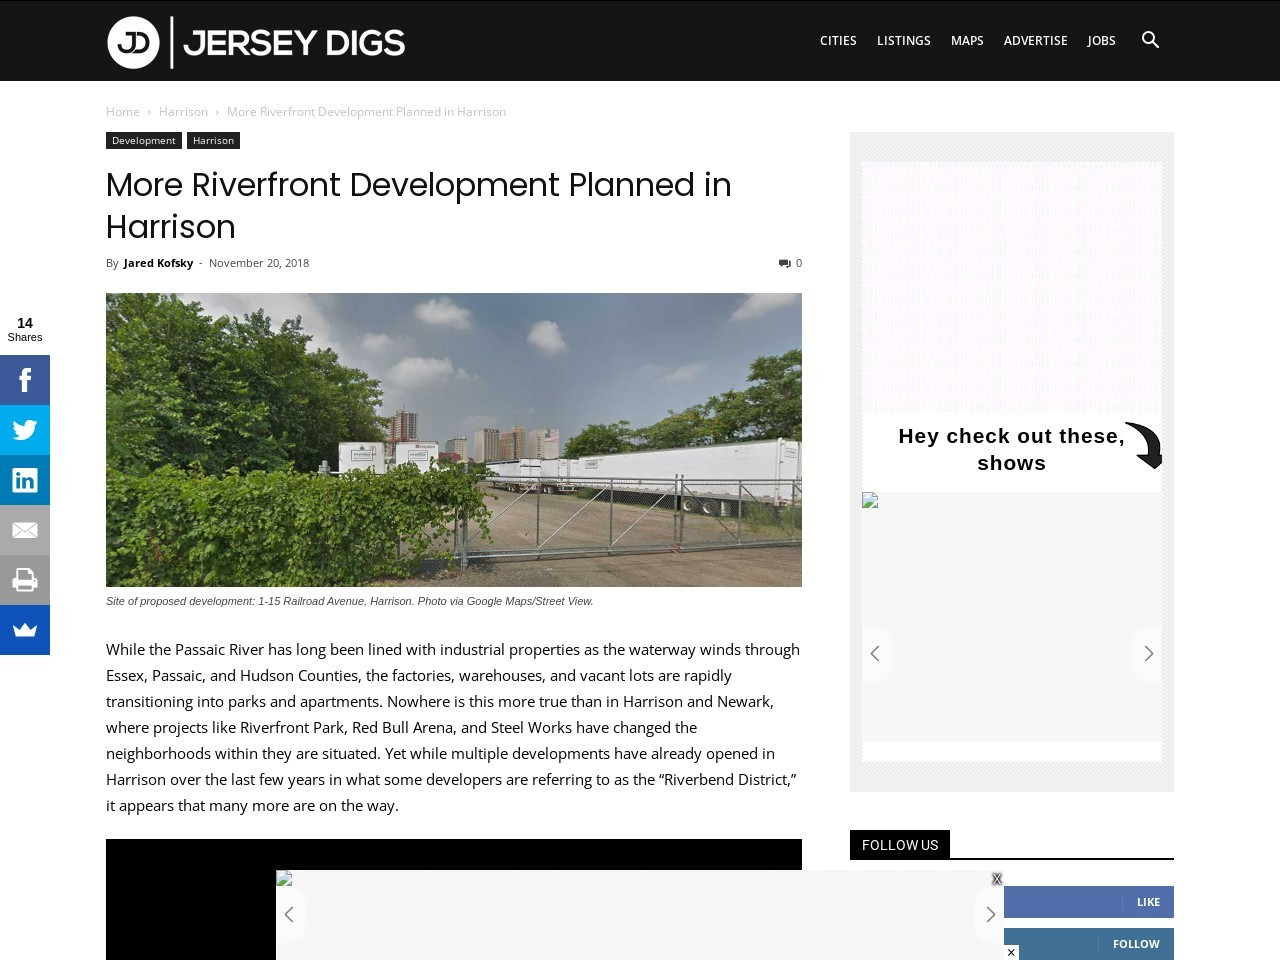 More Riverfront Development Planned in Harrison